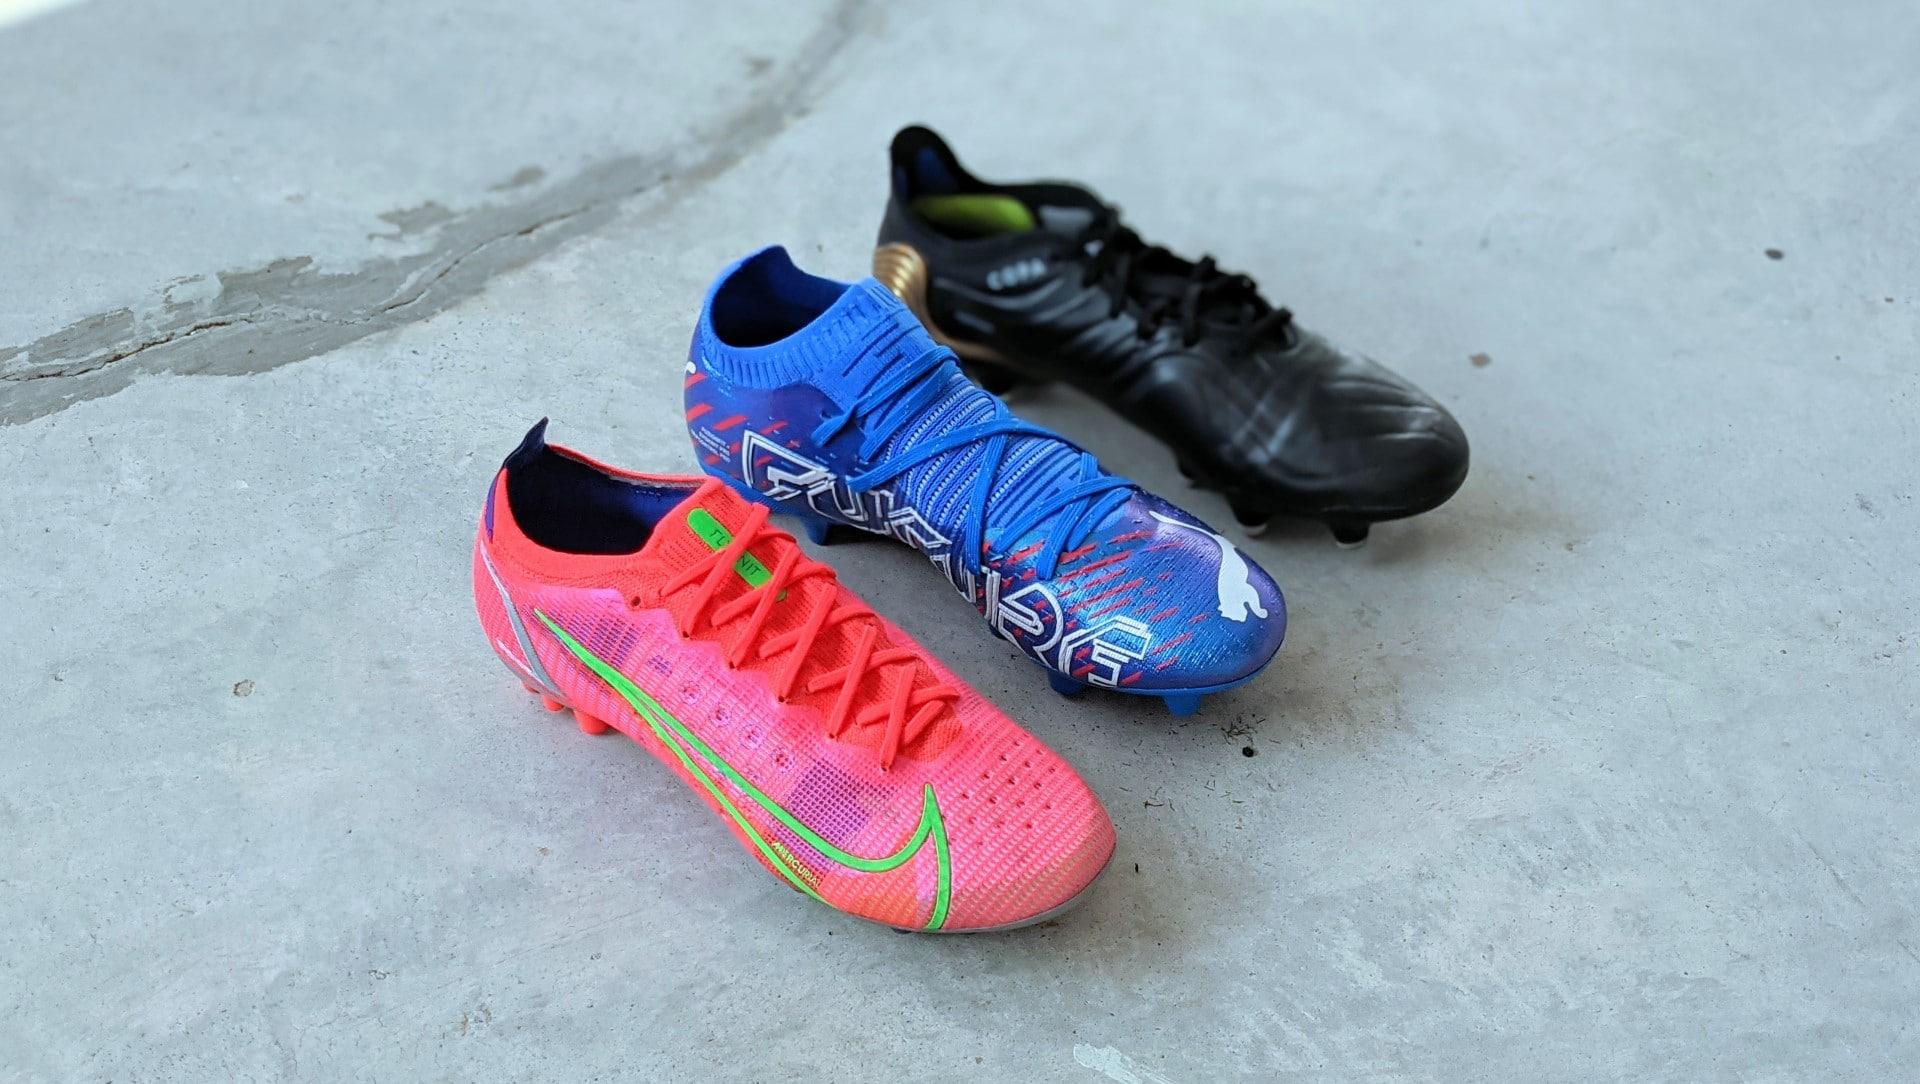 best football boots of 2021 nike mercurial puma future z adidas copa sense